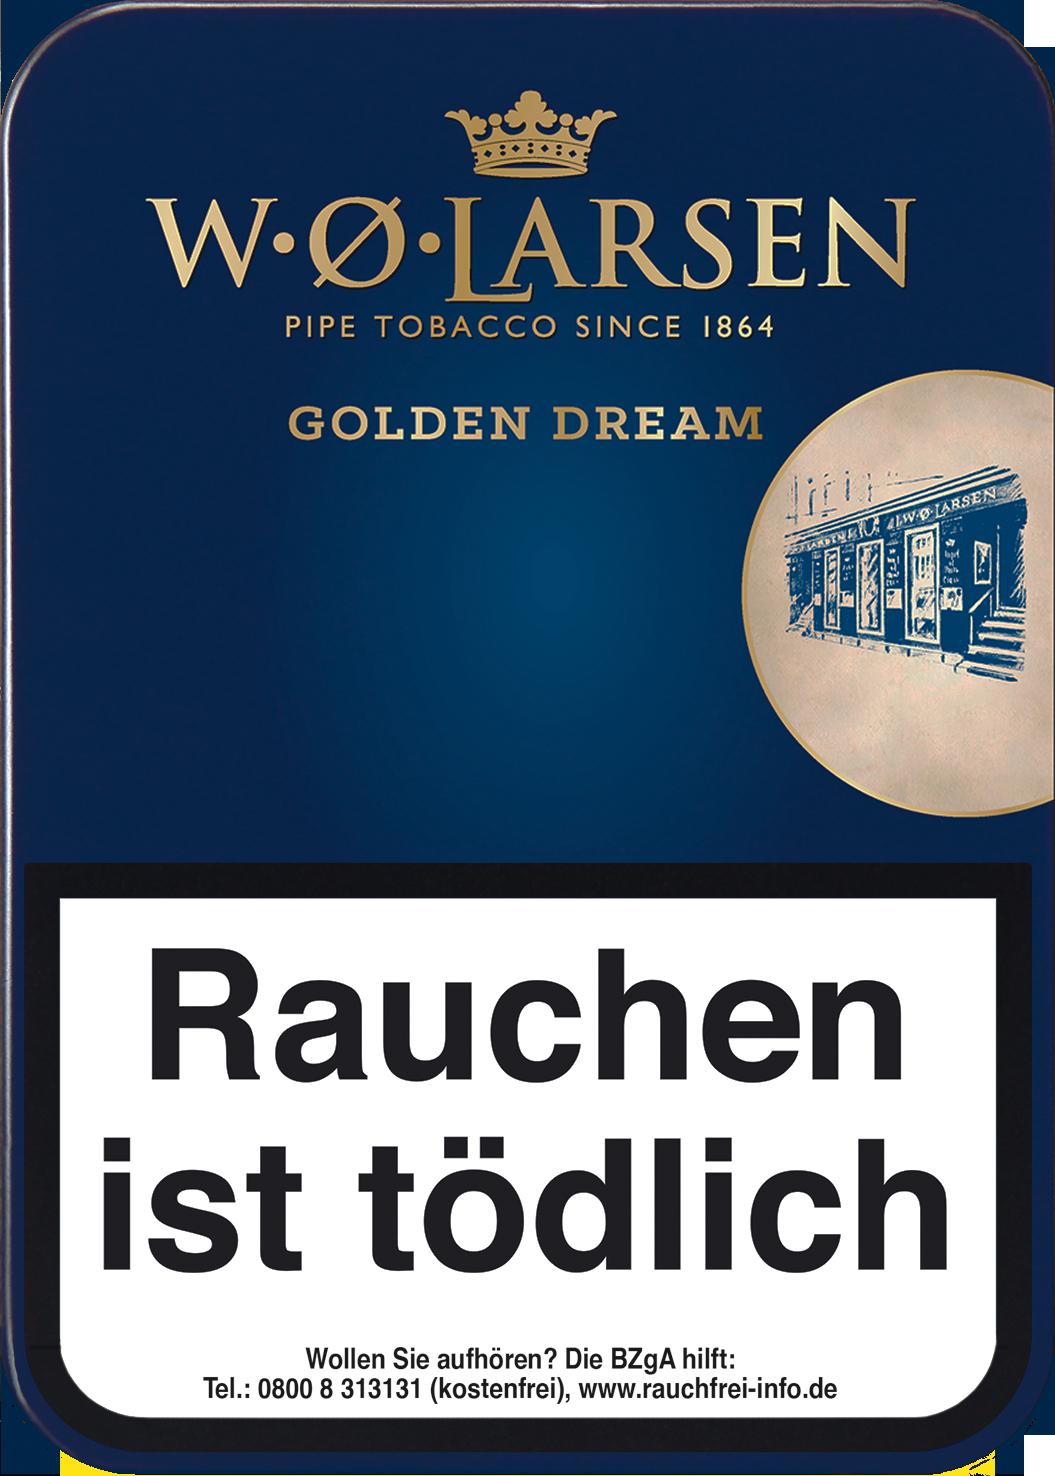 W.Ø. LARSEN Golden Dream Pfeifentabak 100g Dose